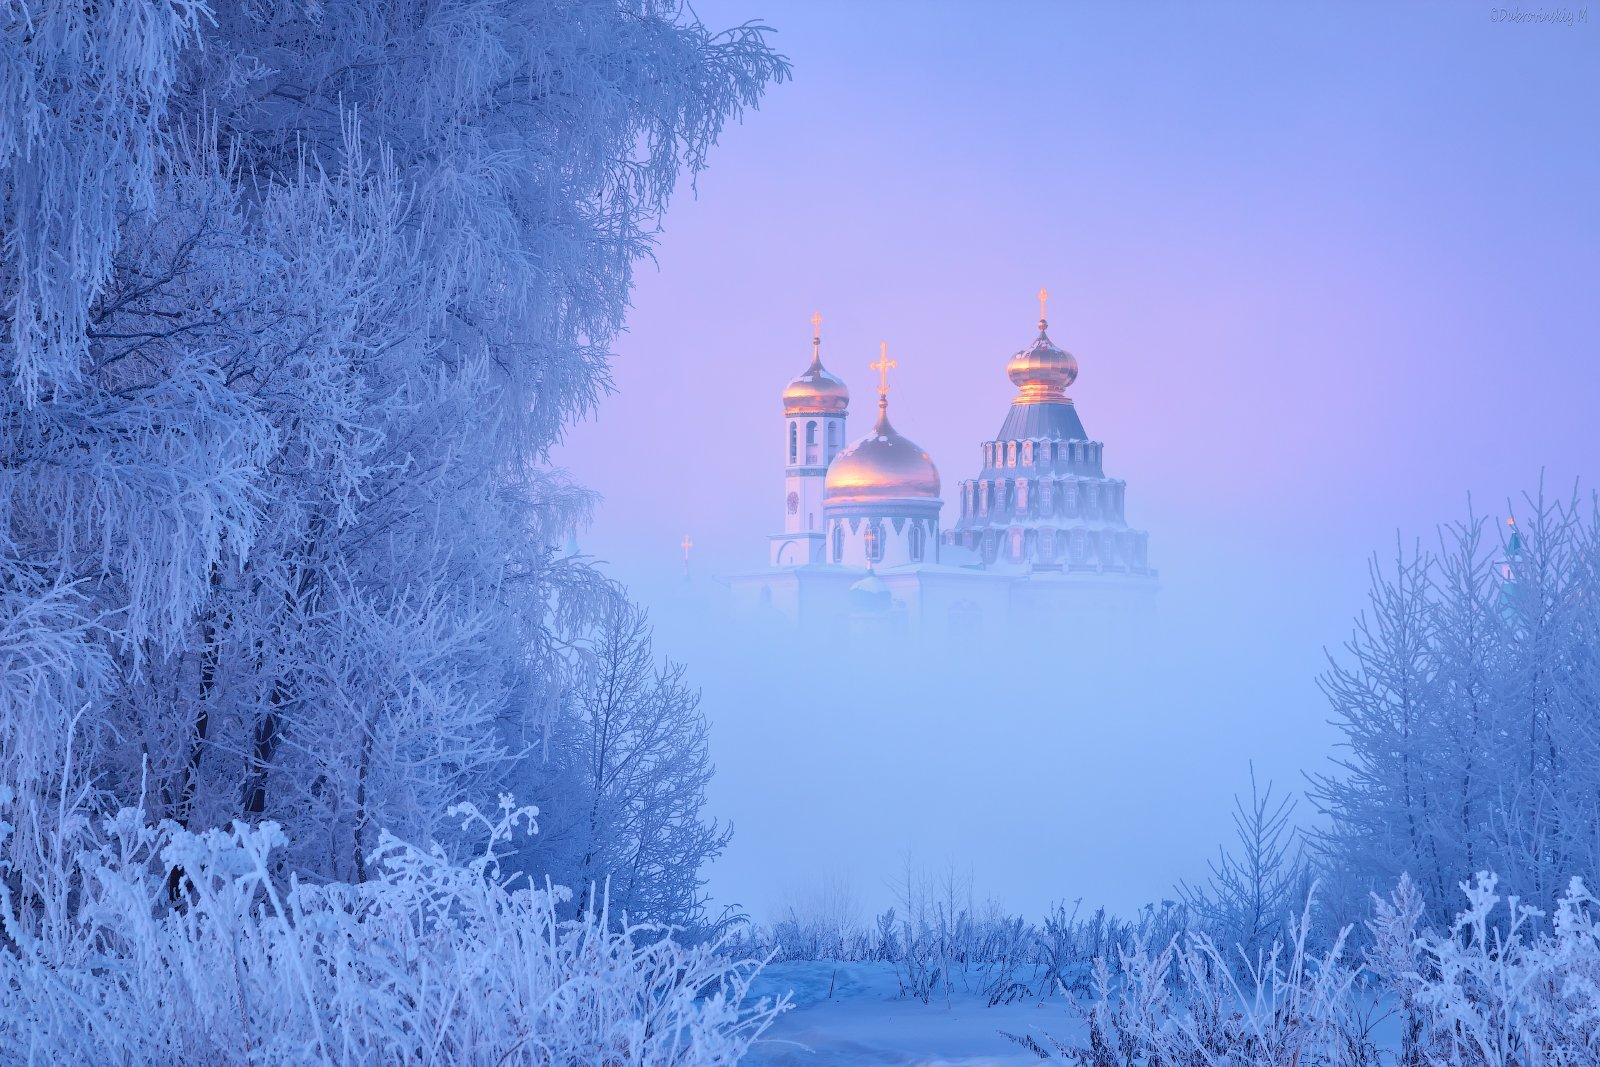 истра, мороз, туман, Михаил Дубровинский